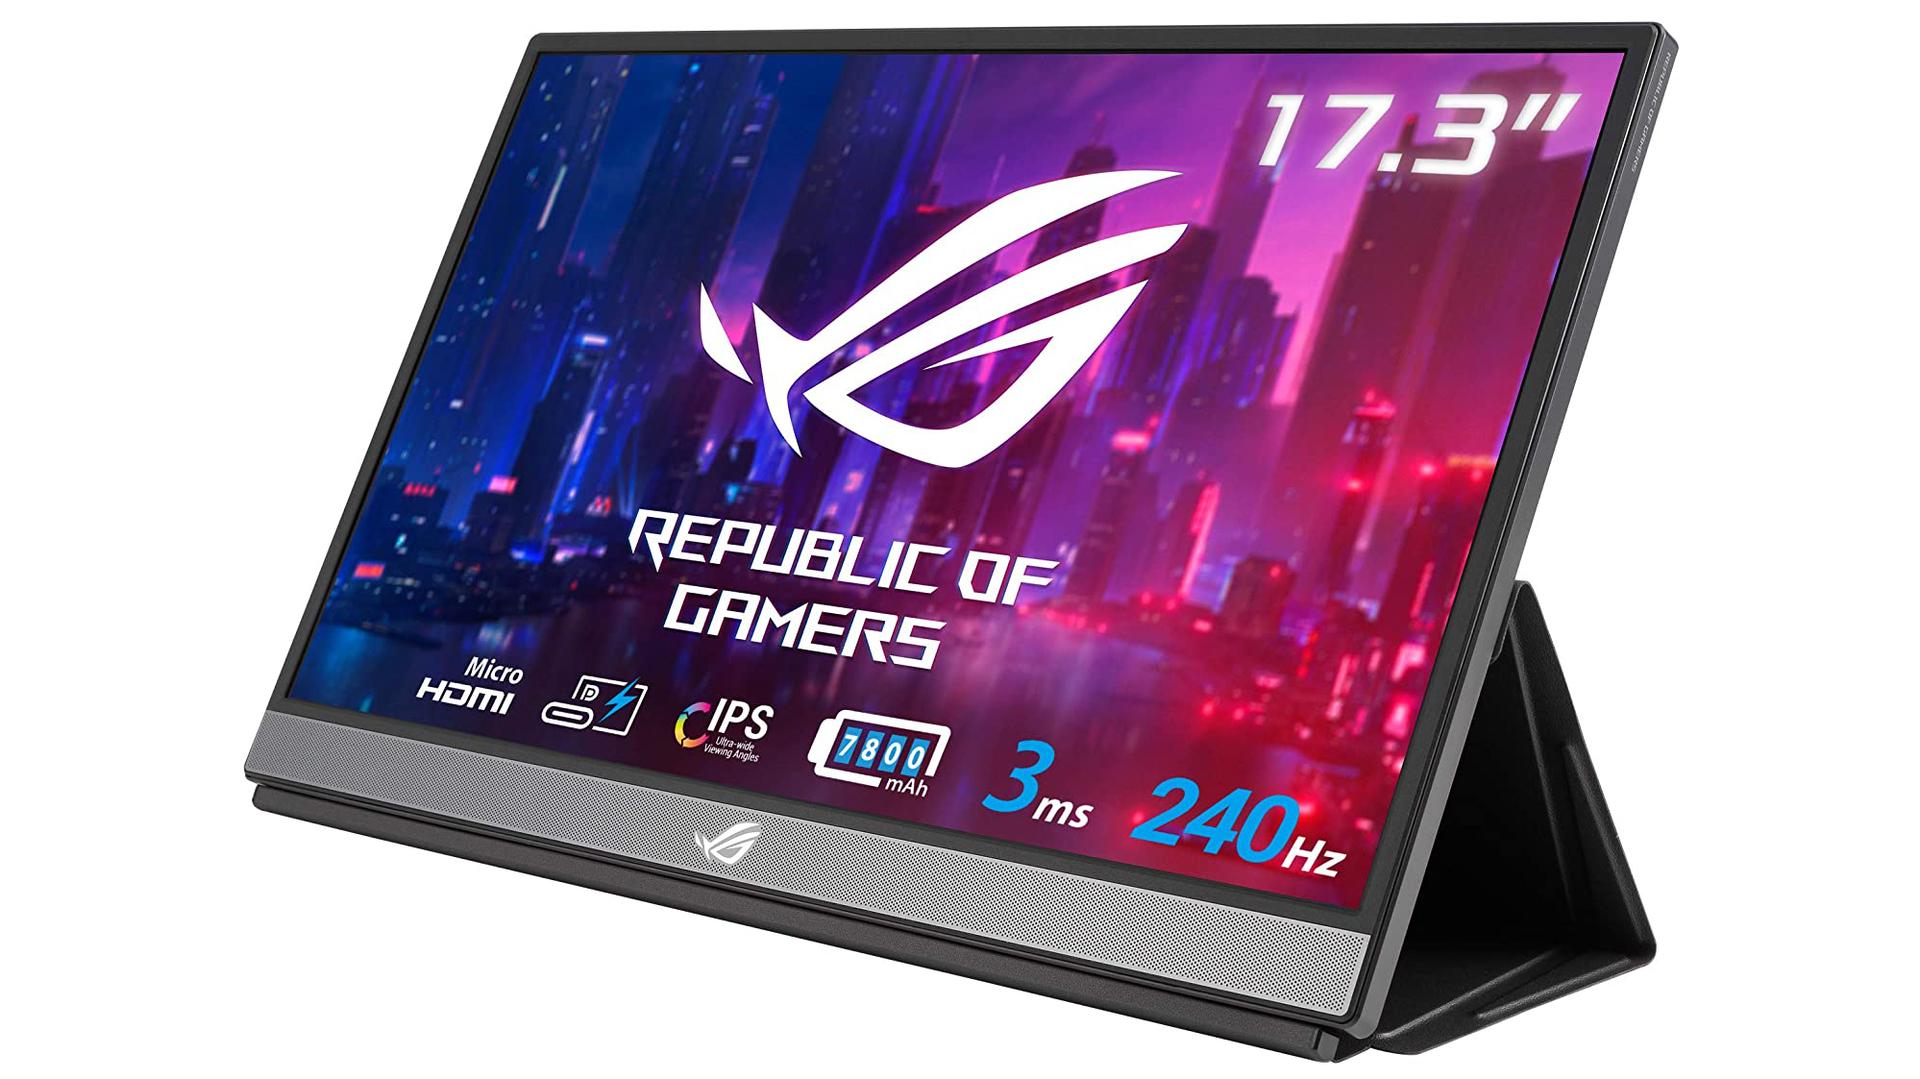 Asus ROG Strix portable monitor